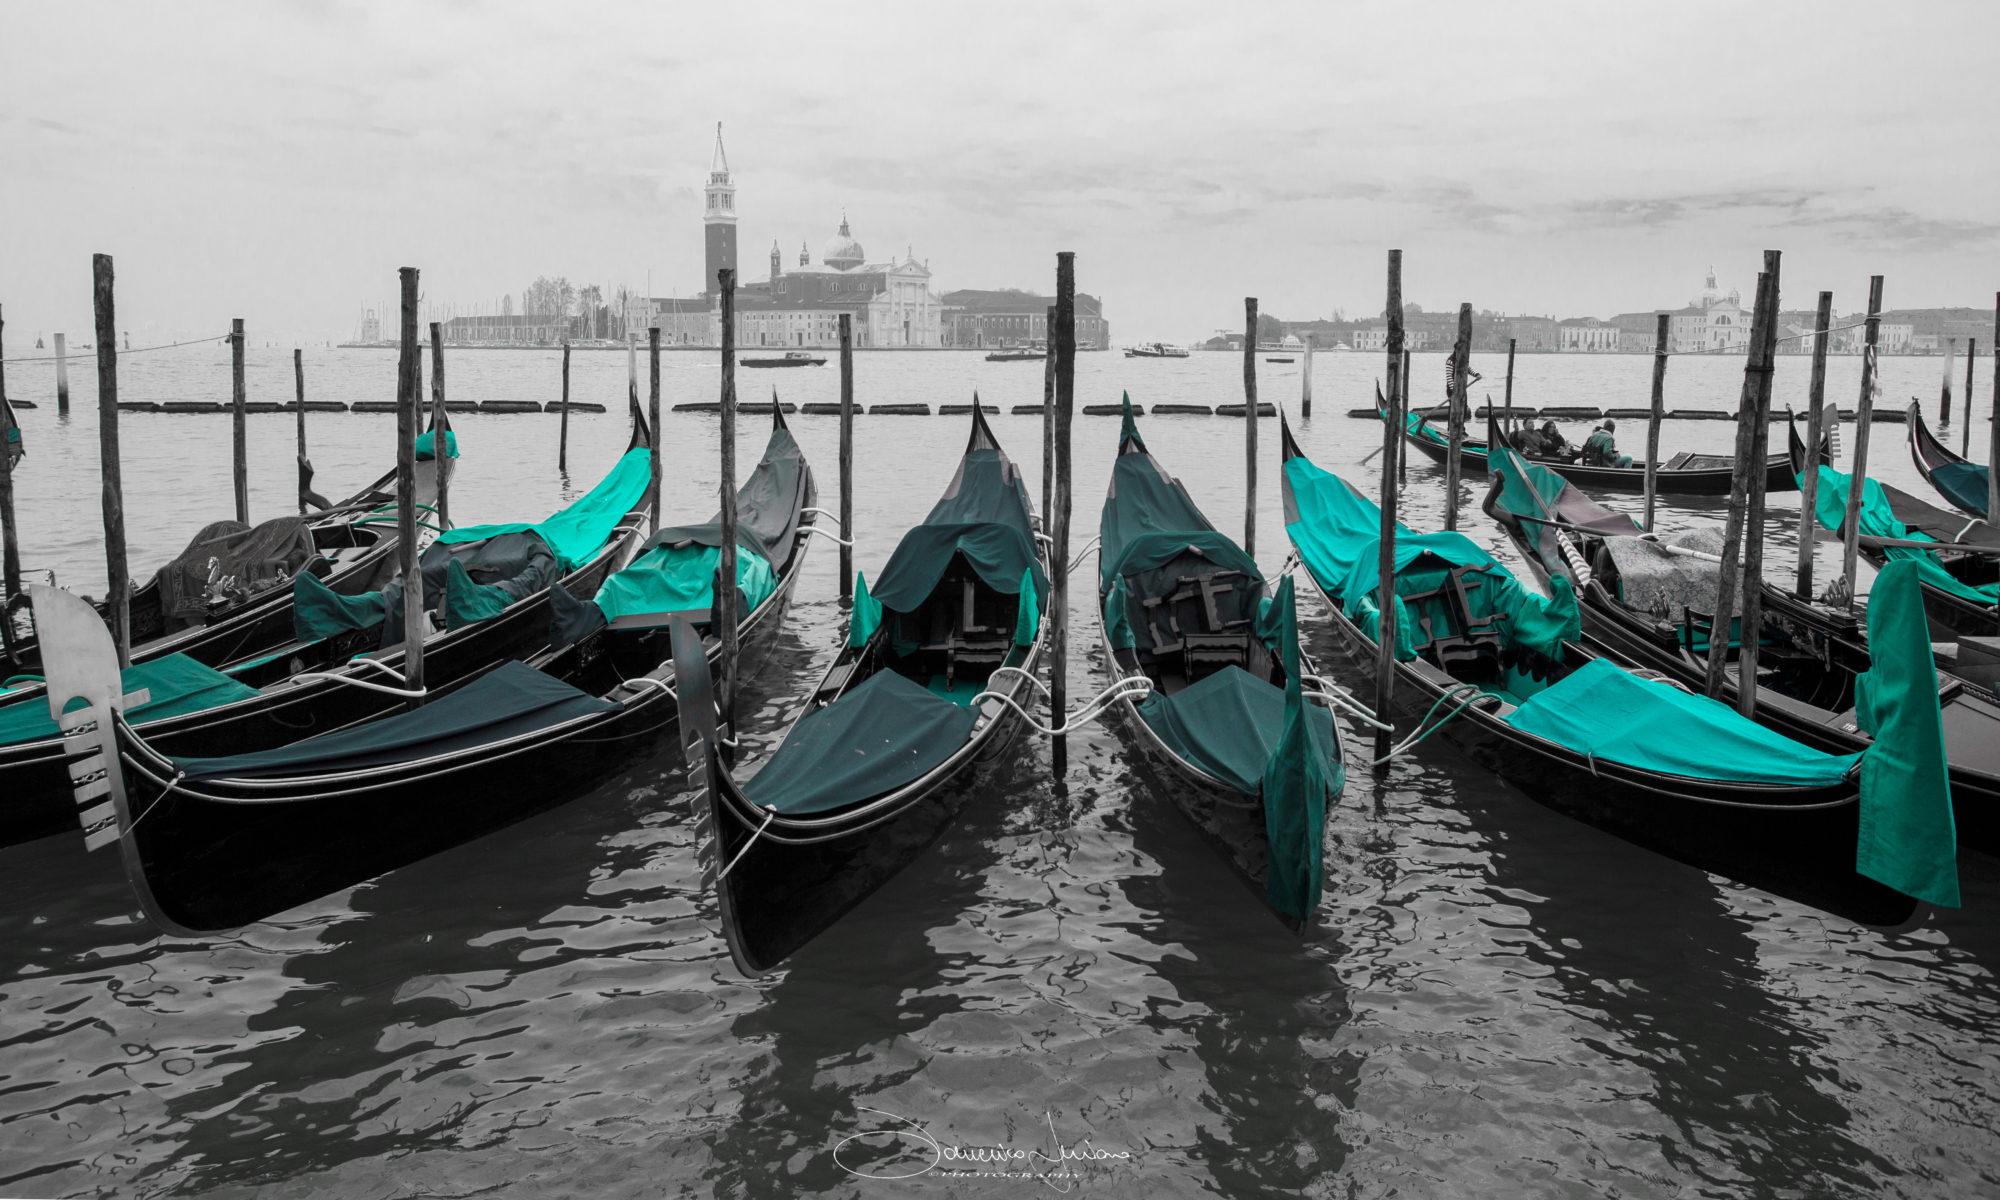 Domenico Luciano Photography